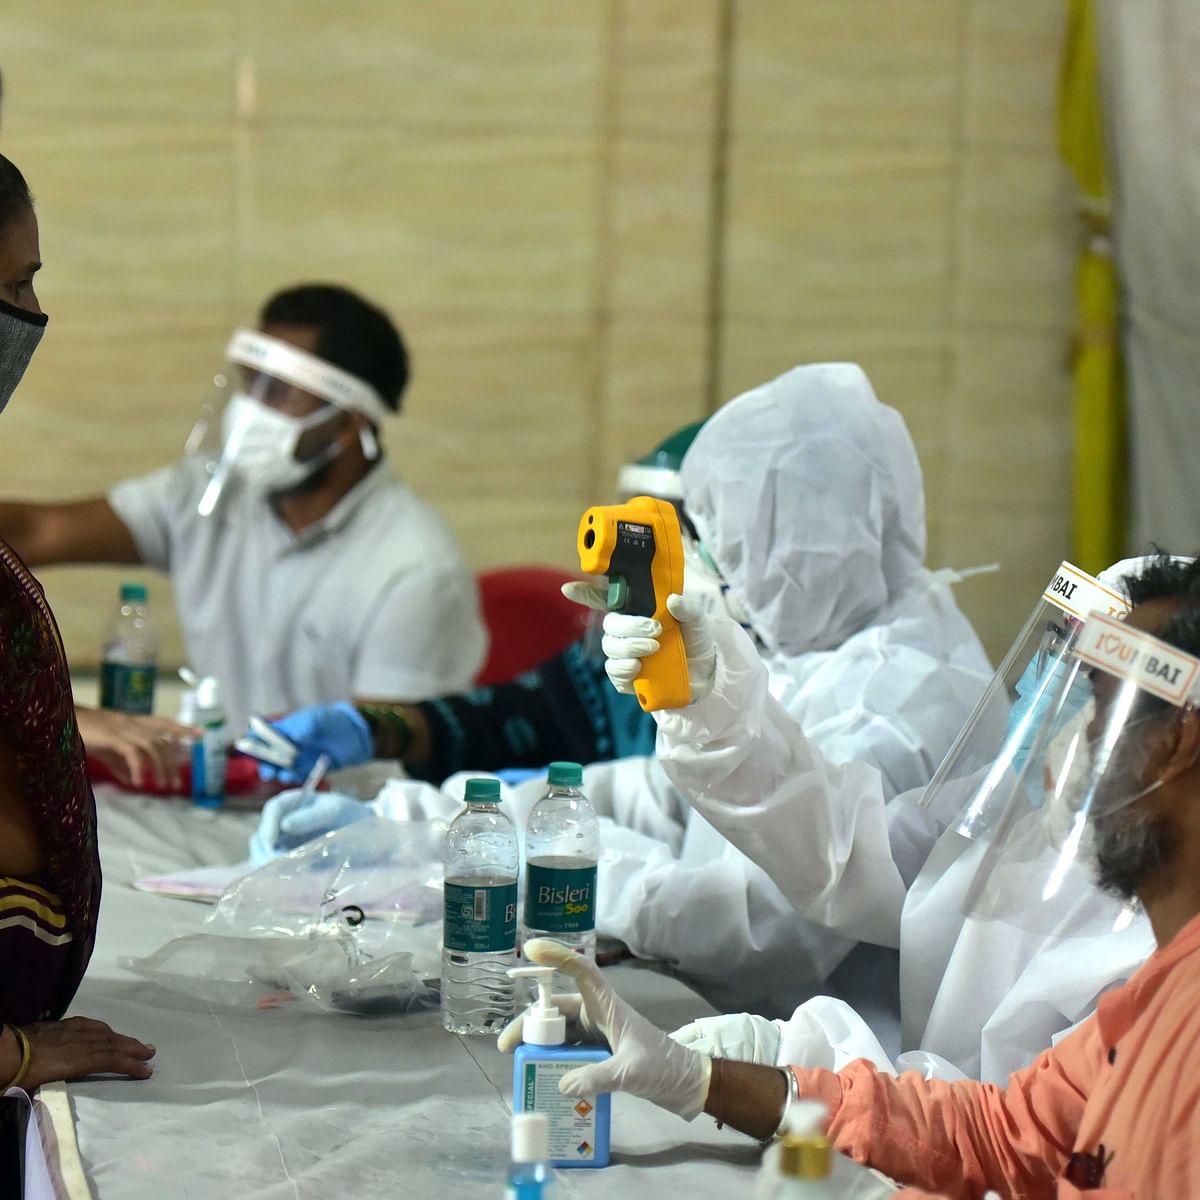 Coronavirus in Kerala: Govt worried over Unlock 1 relaxations, set to retain controls